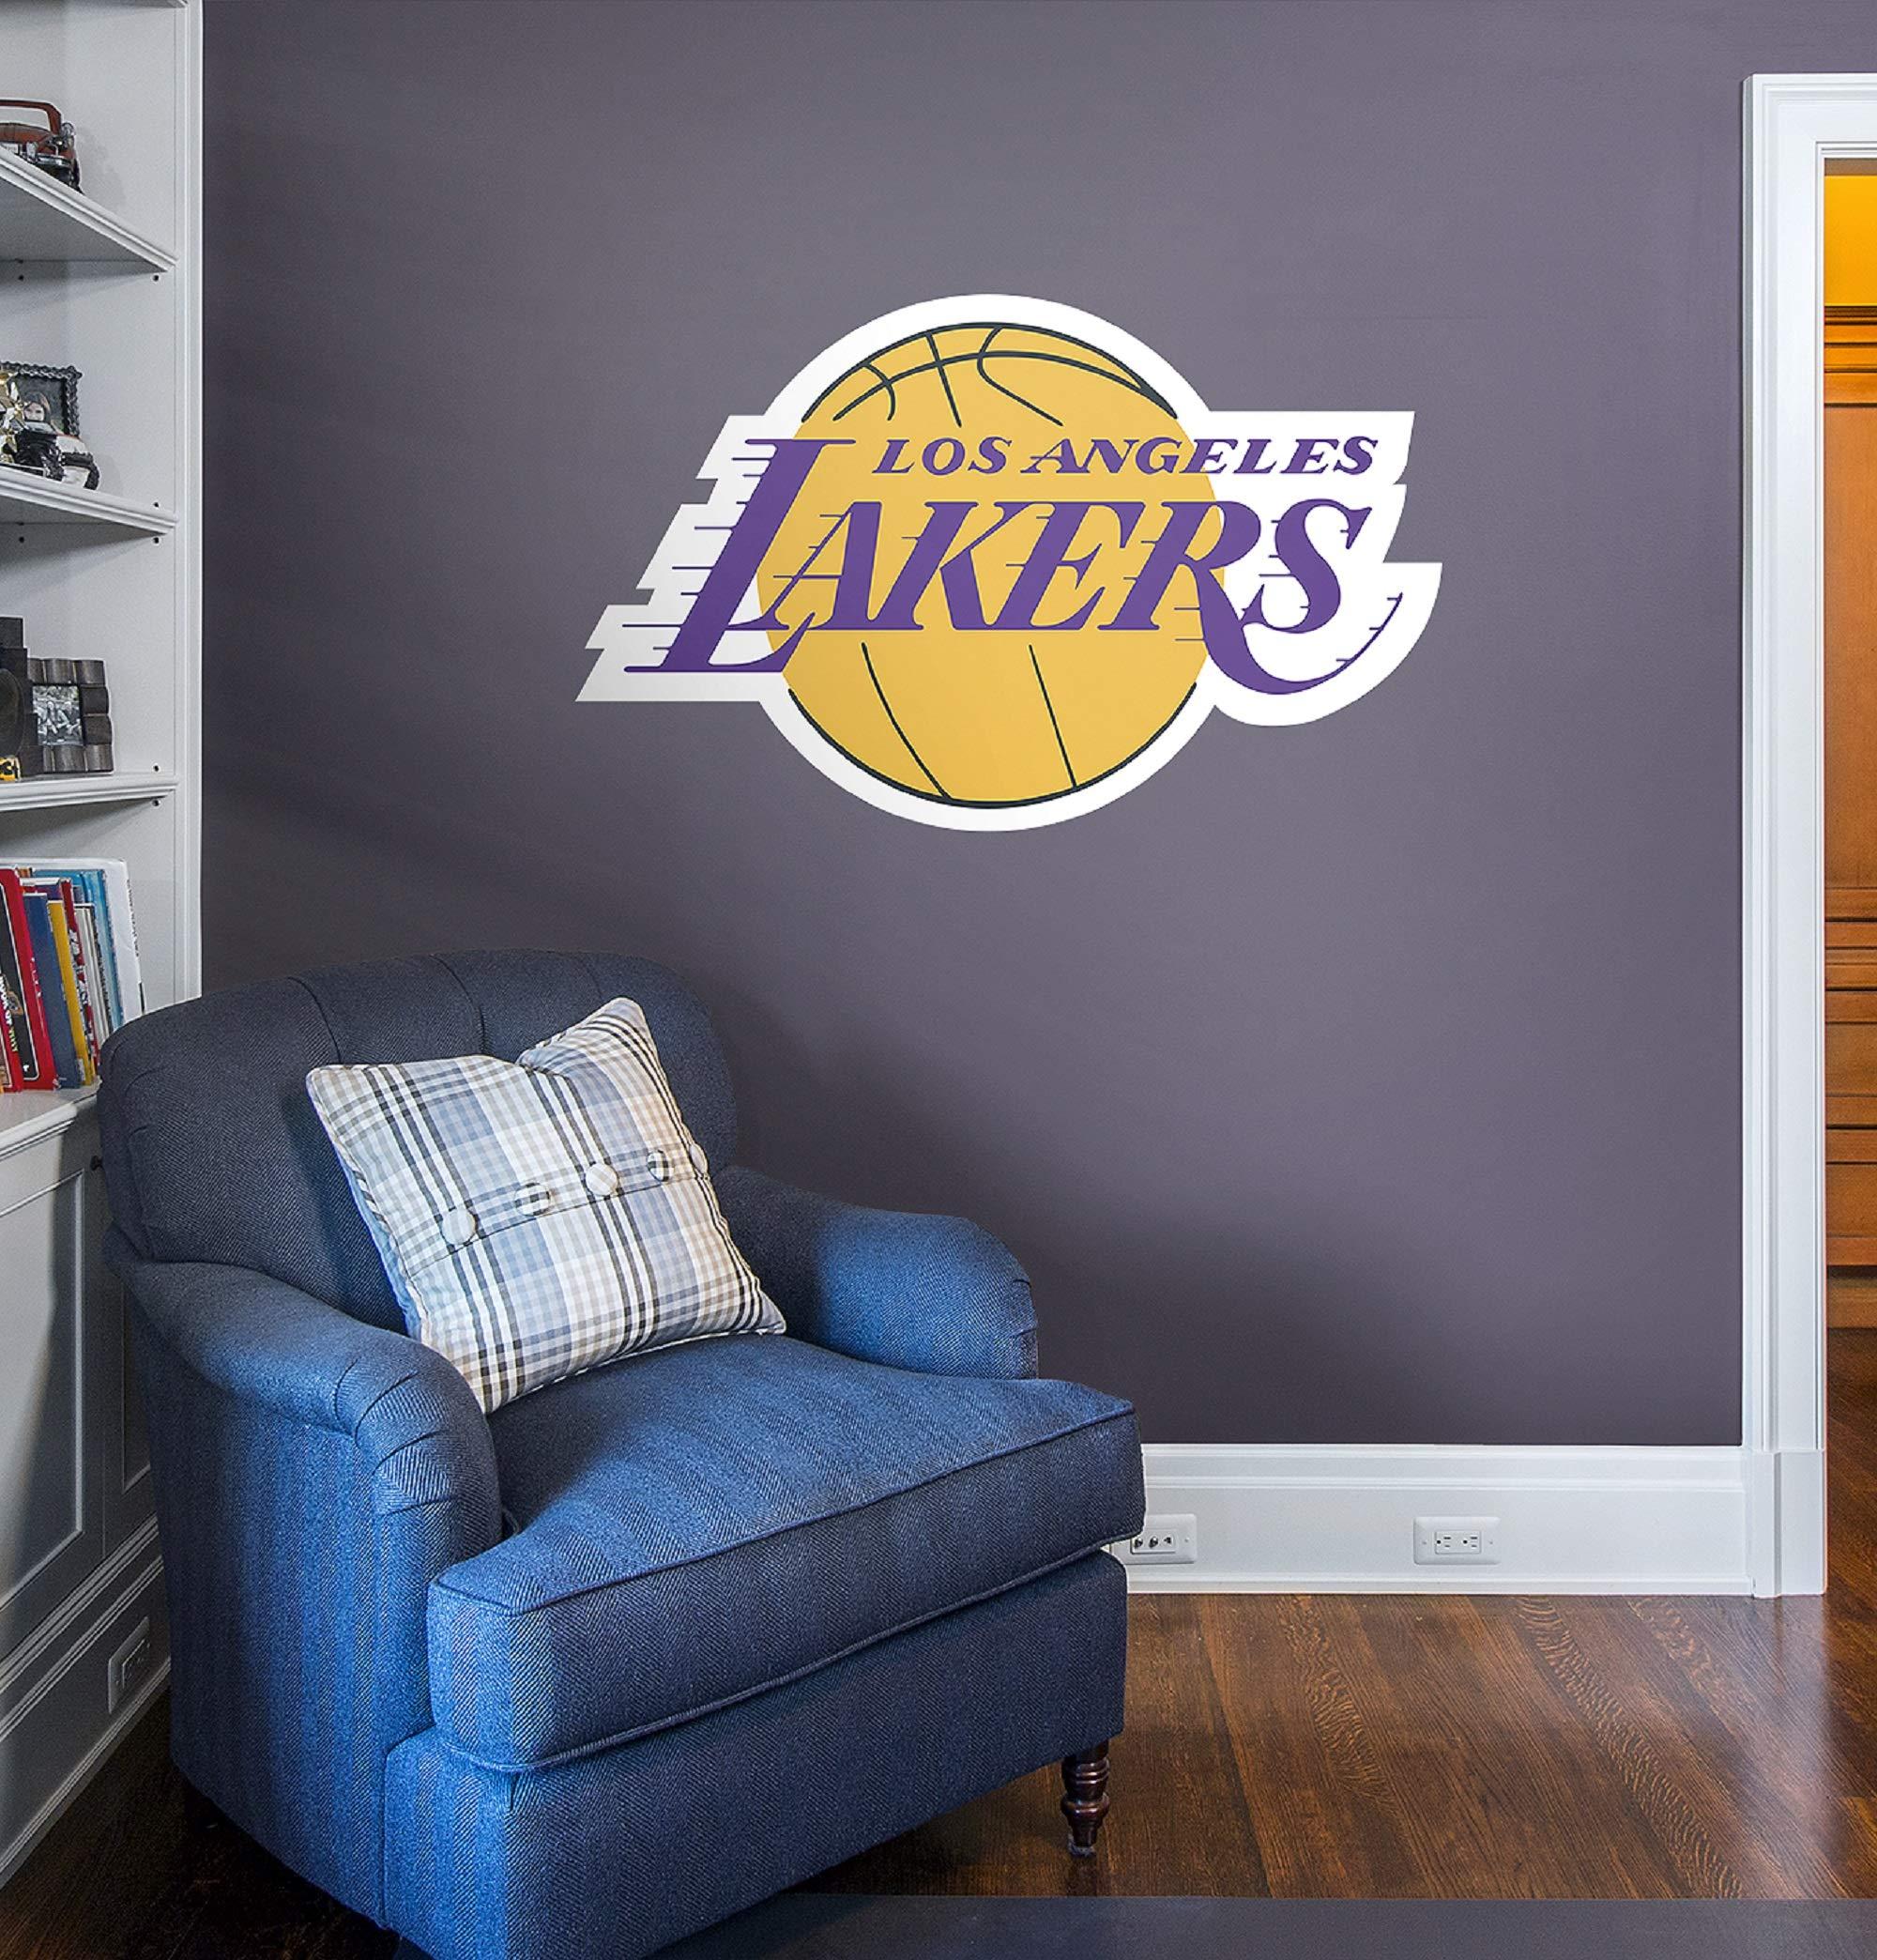 Fathead NBA Los Angeles Lakers Los Angeles Lakers by Fathead